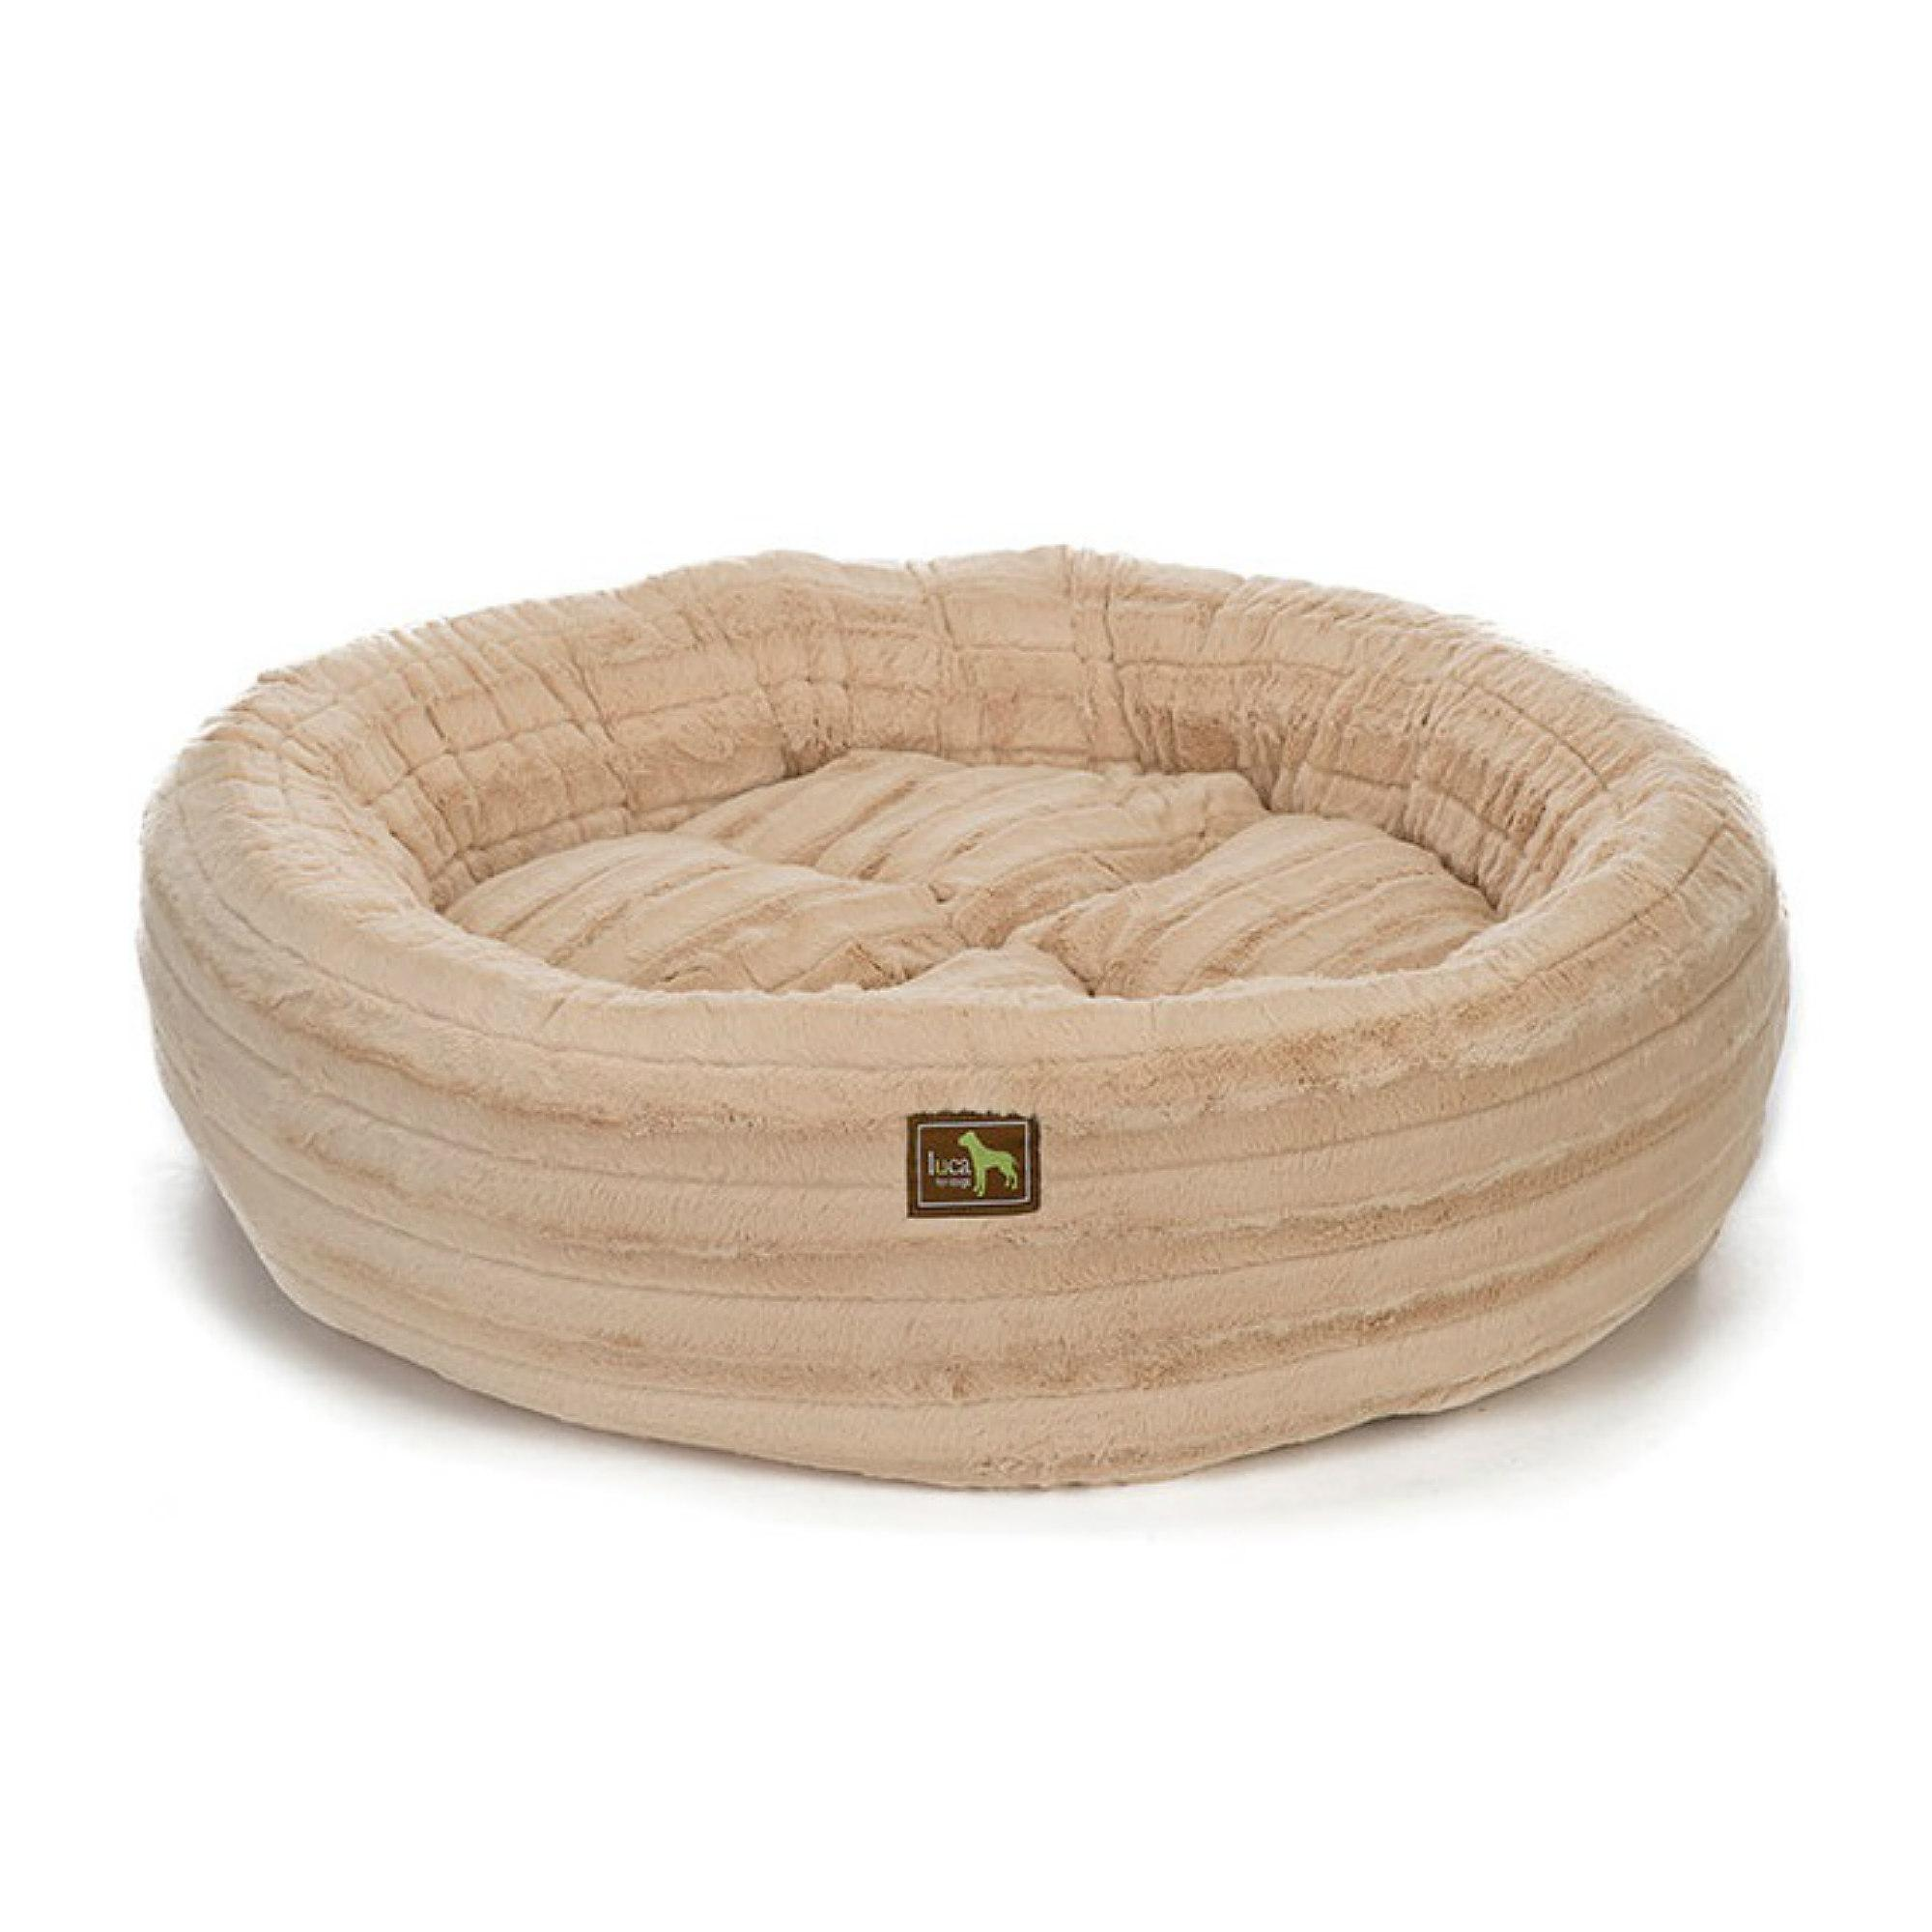 Luca Chinchilla Nest Plush Dog Bed - Camel